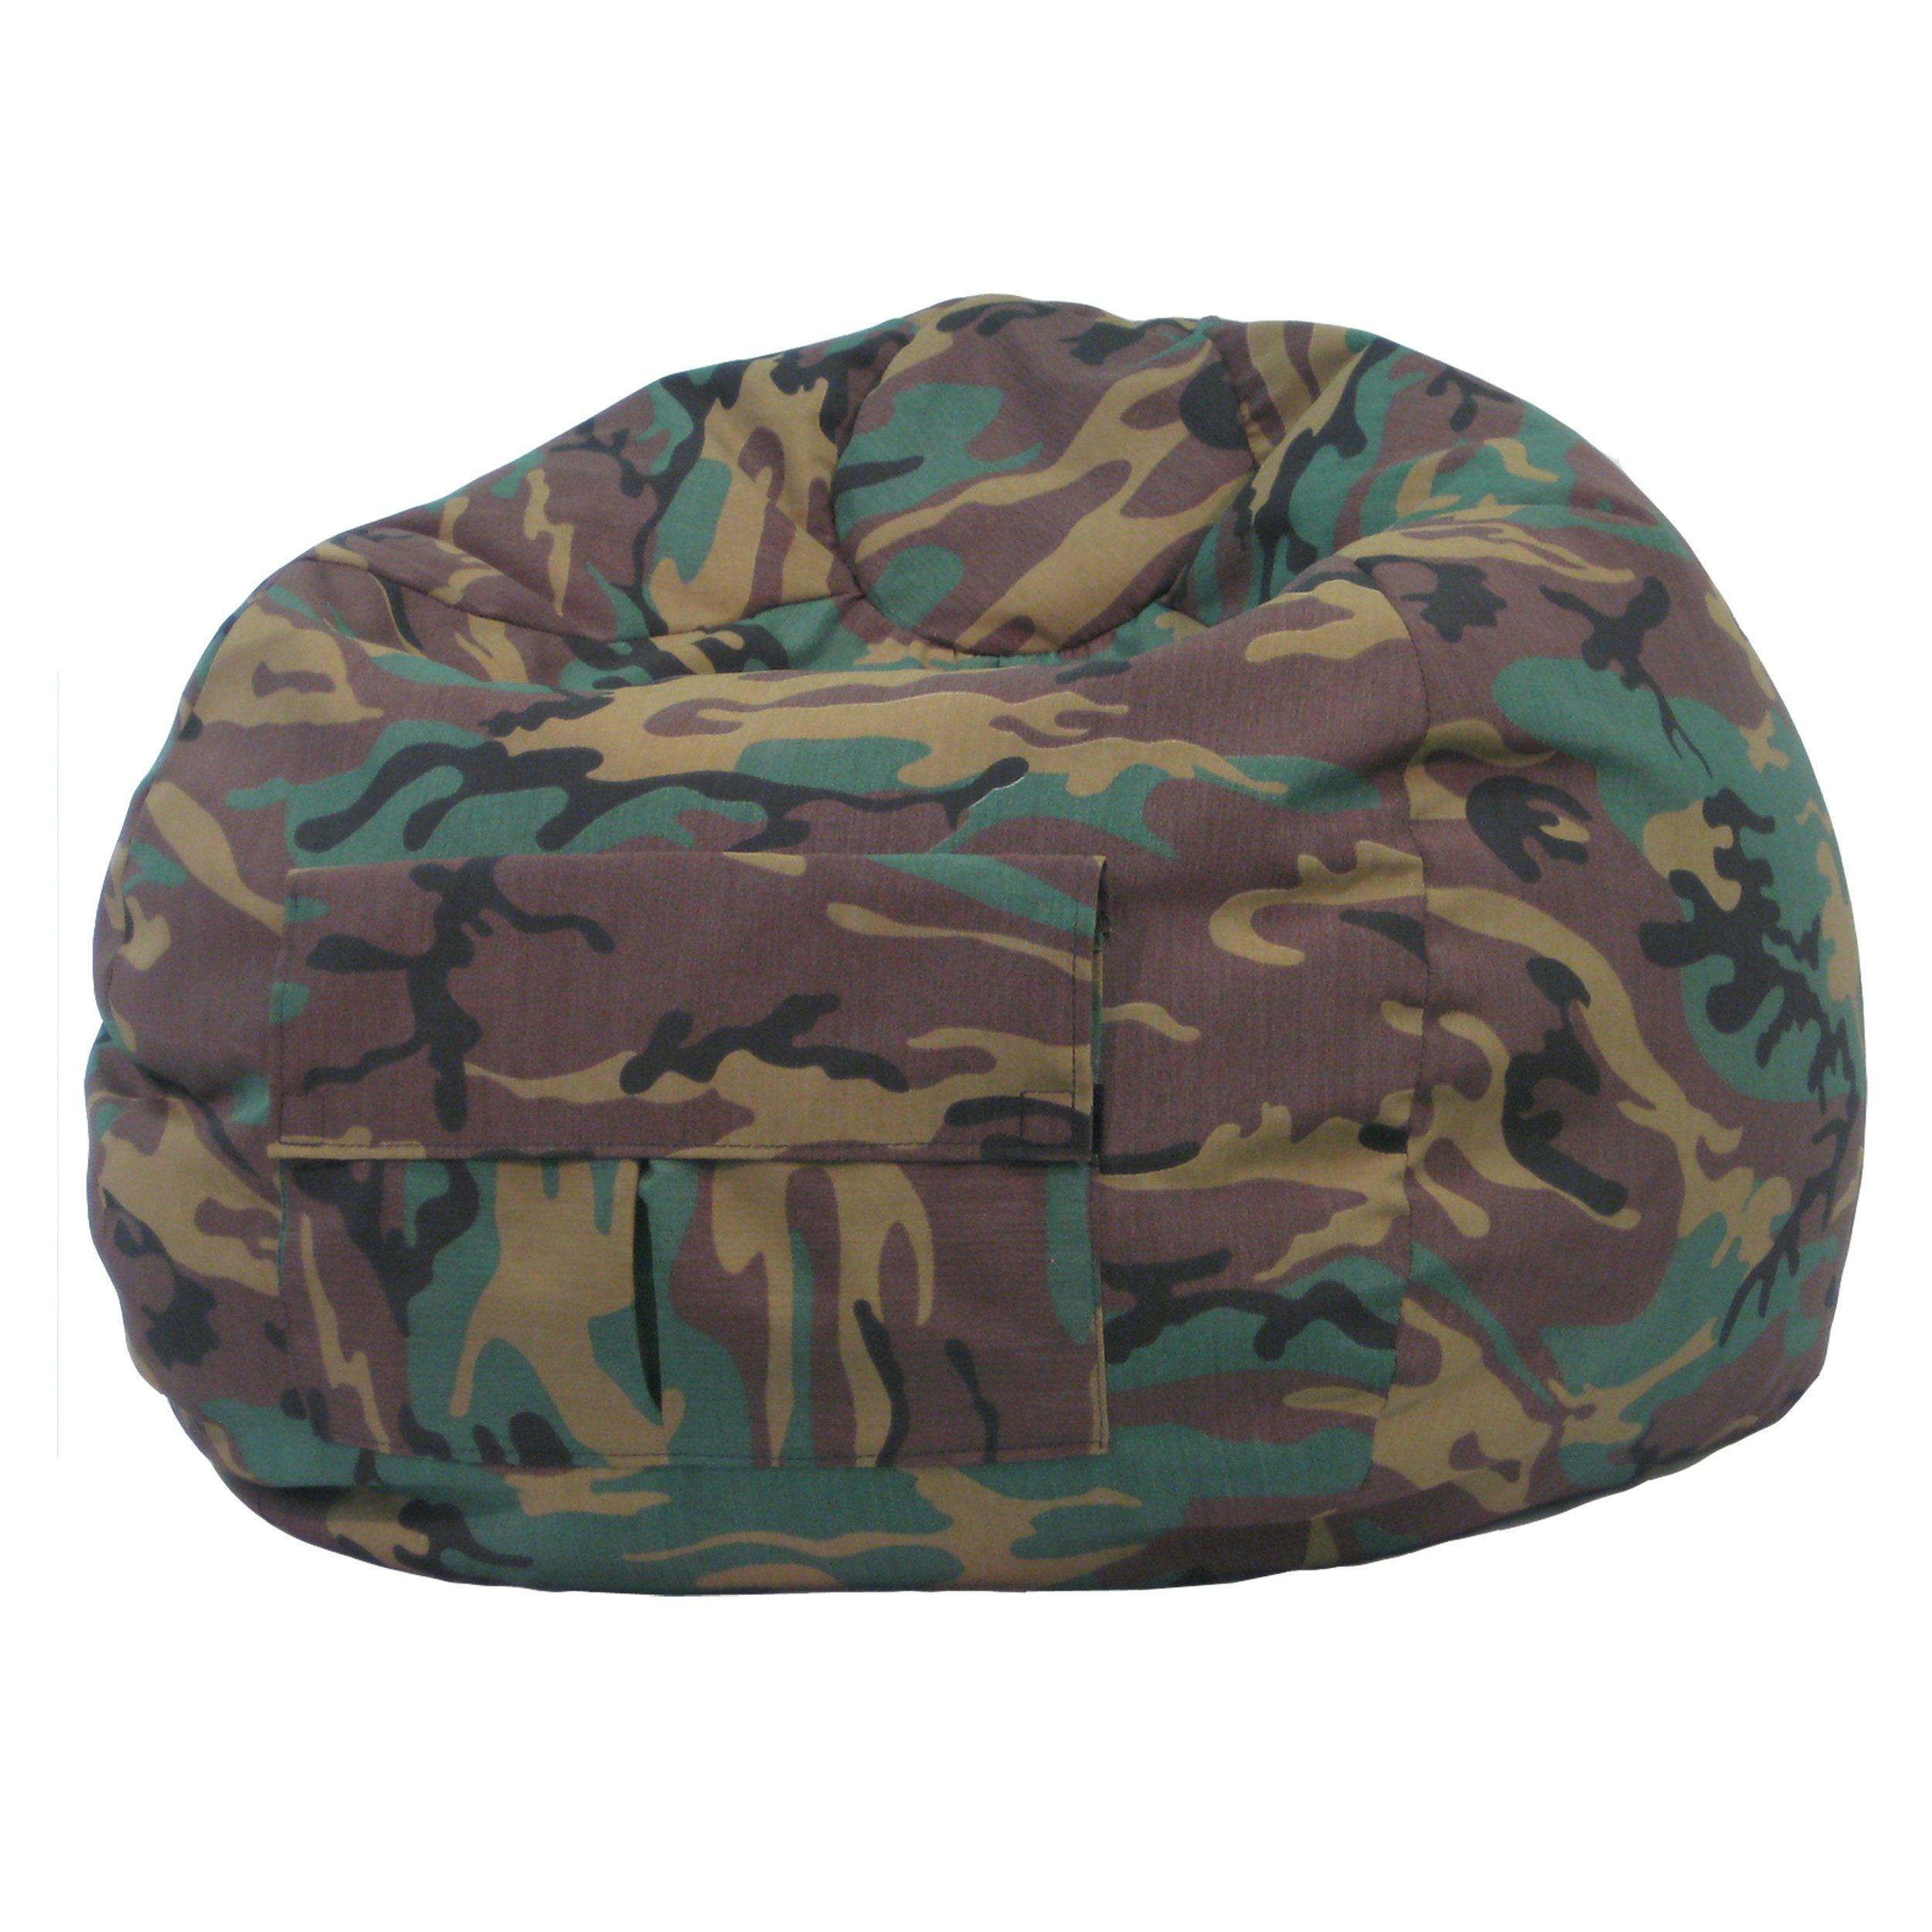 Gold Medal Bean Bags 31014084925 XX-Large Denim Bean Bag with Pocket, Camoflouge